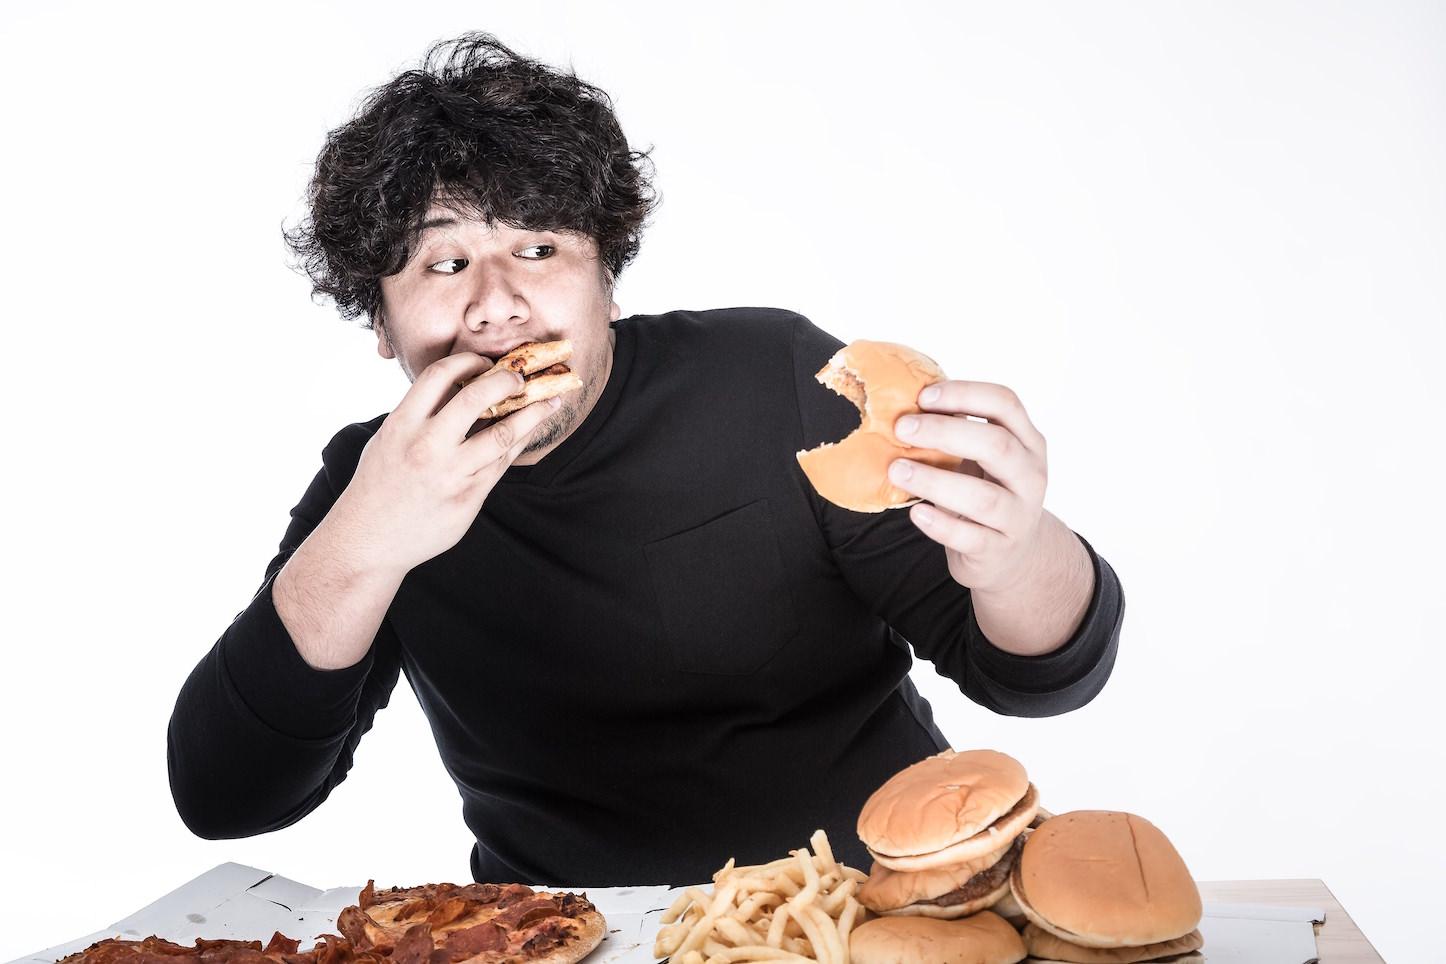 Kuchiki eating mcdonalds